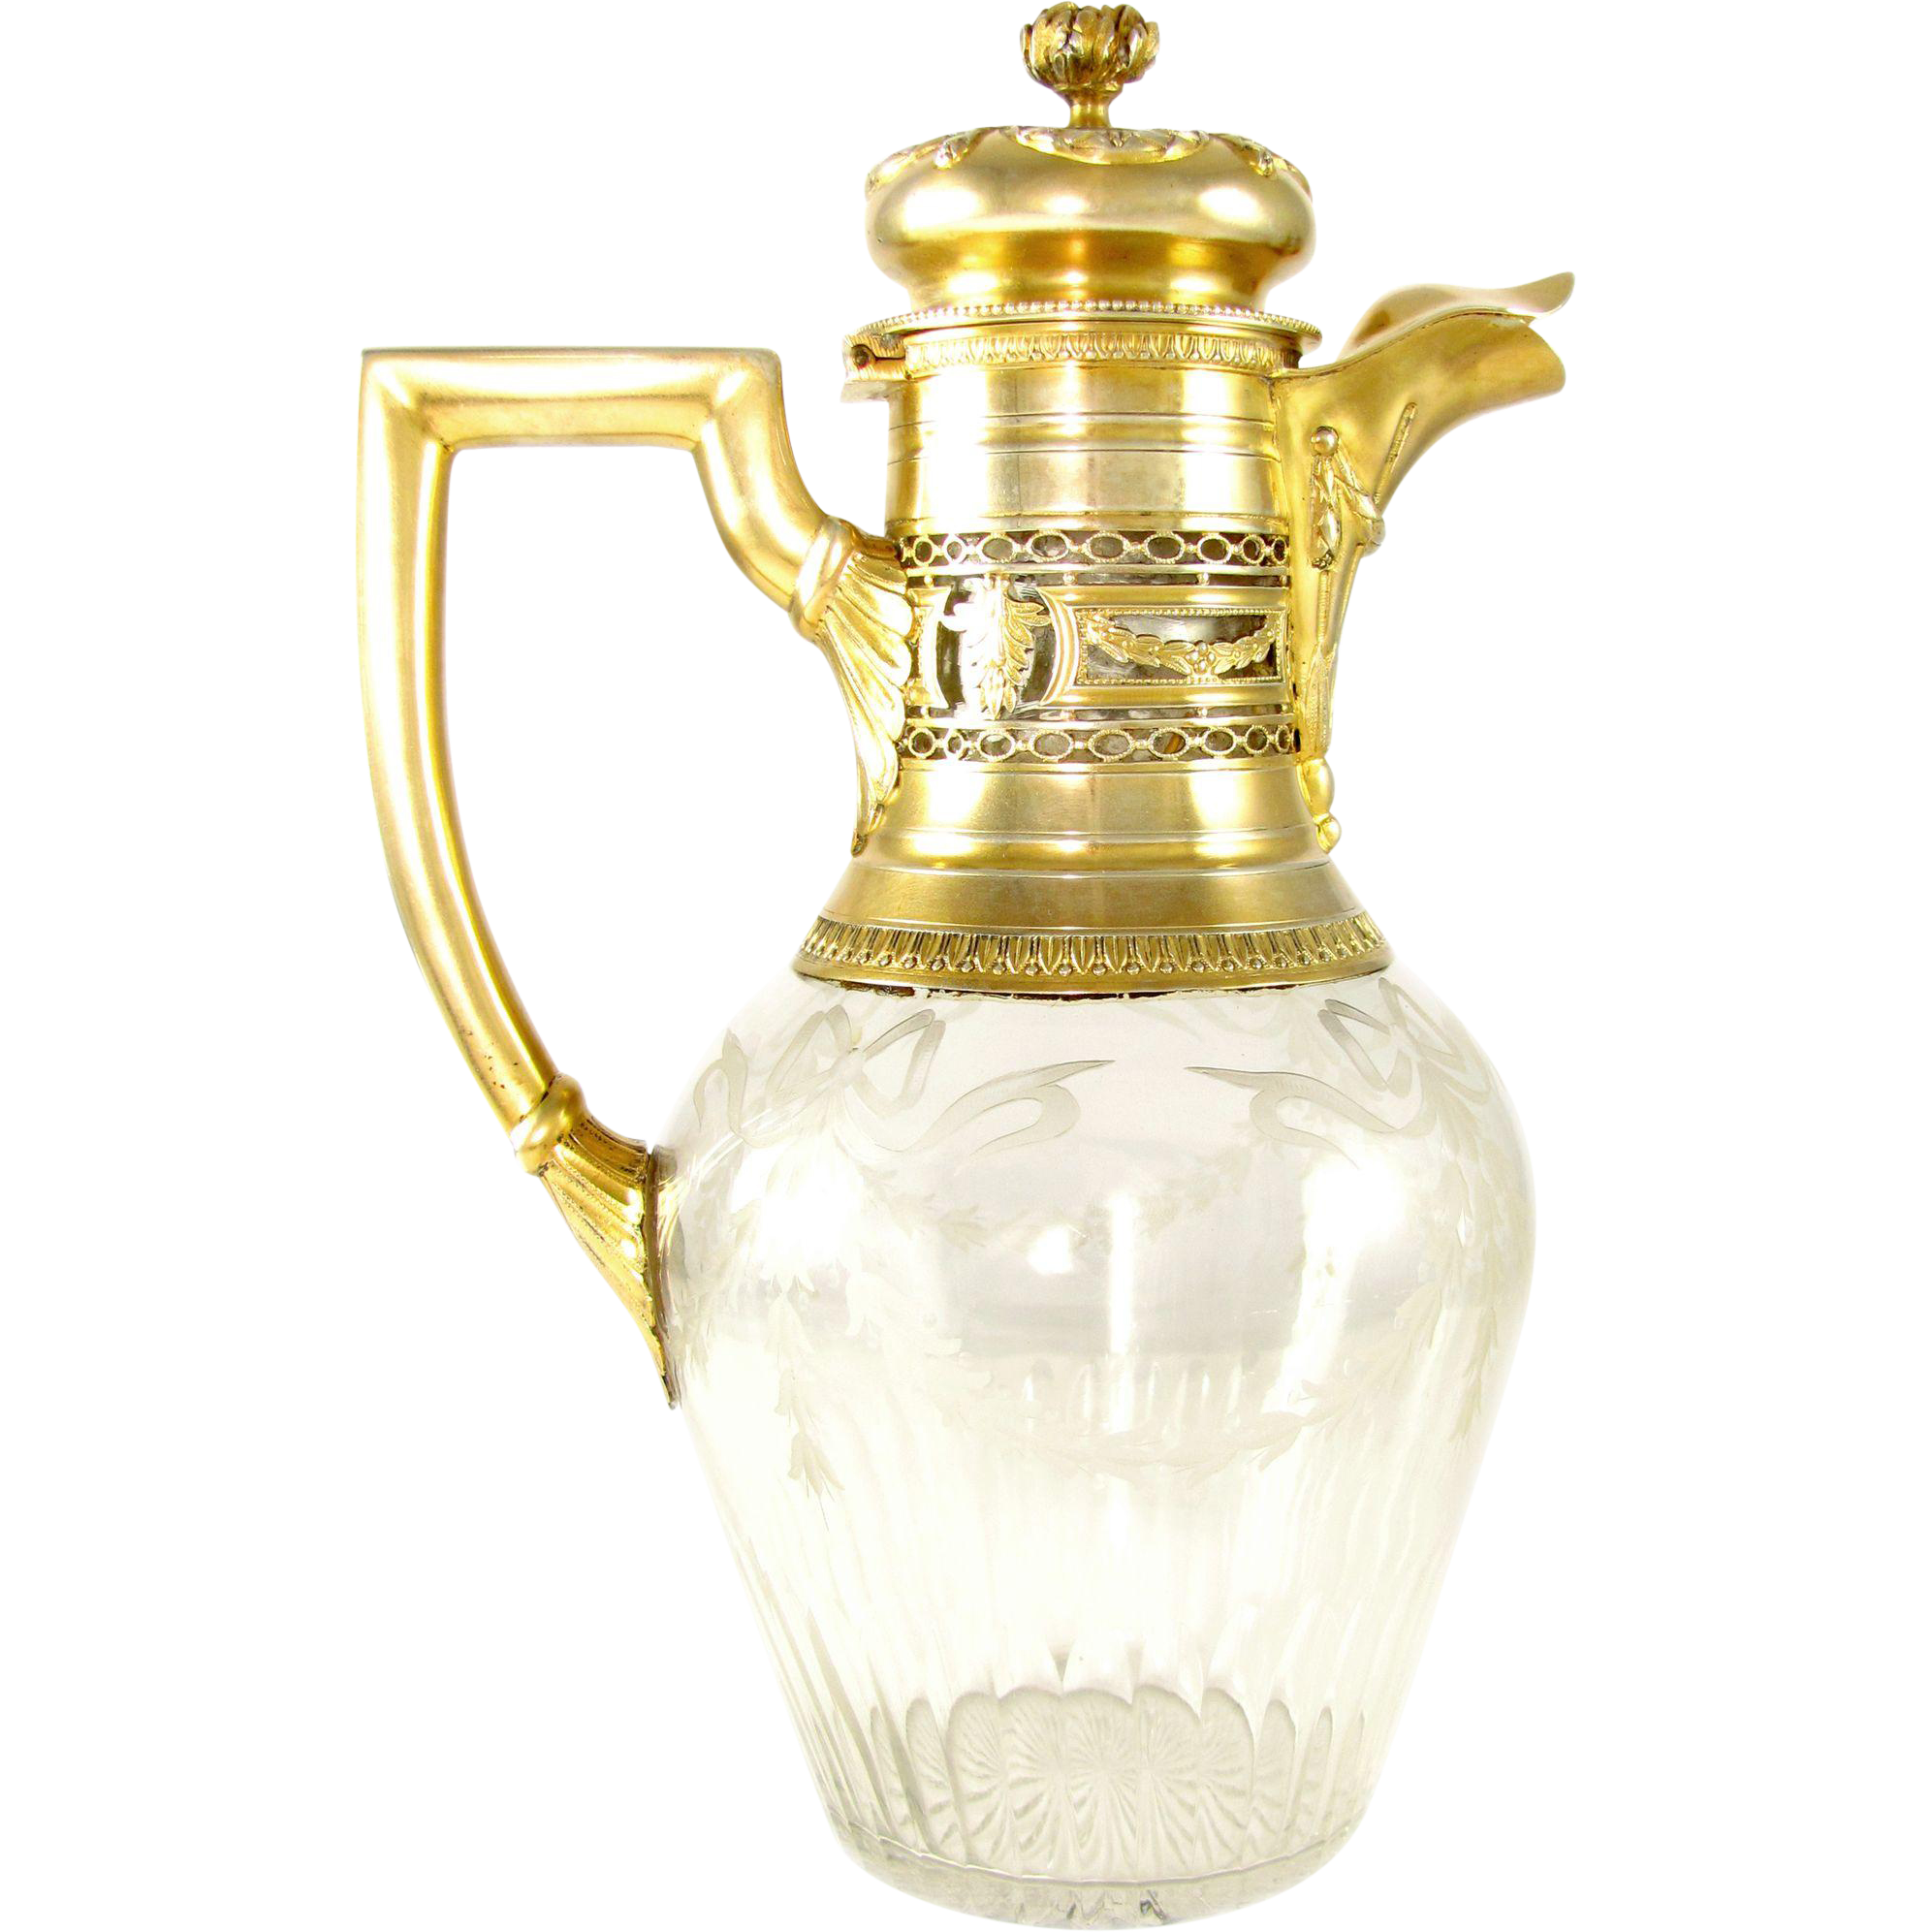 Antique French Sterling Silver Gilt Vermeil & Floral Engraved Cut Crystal Claret Jug Decanter